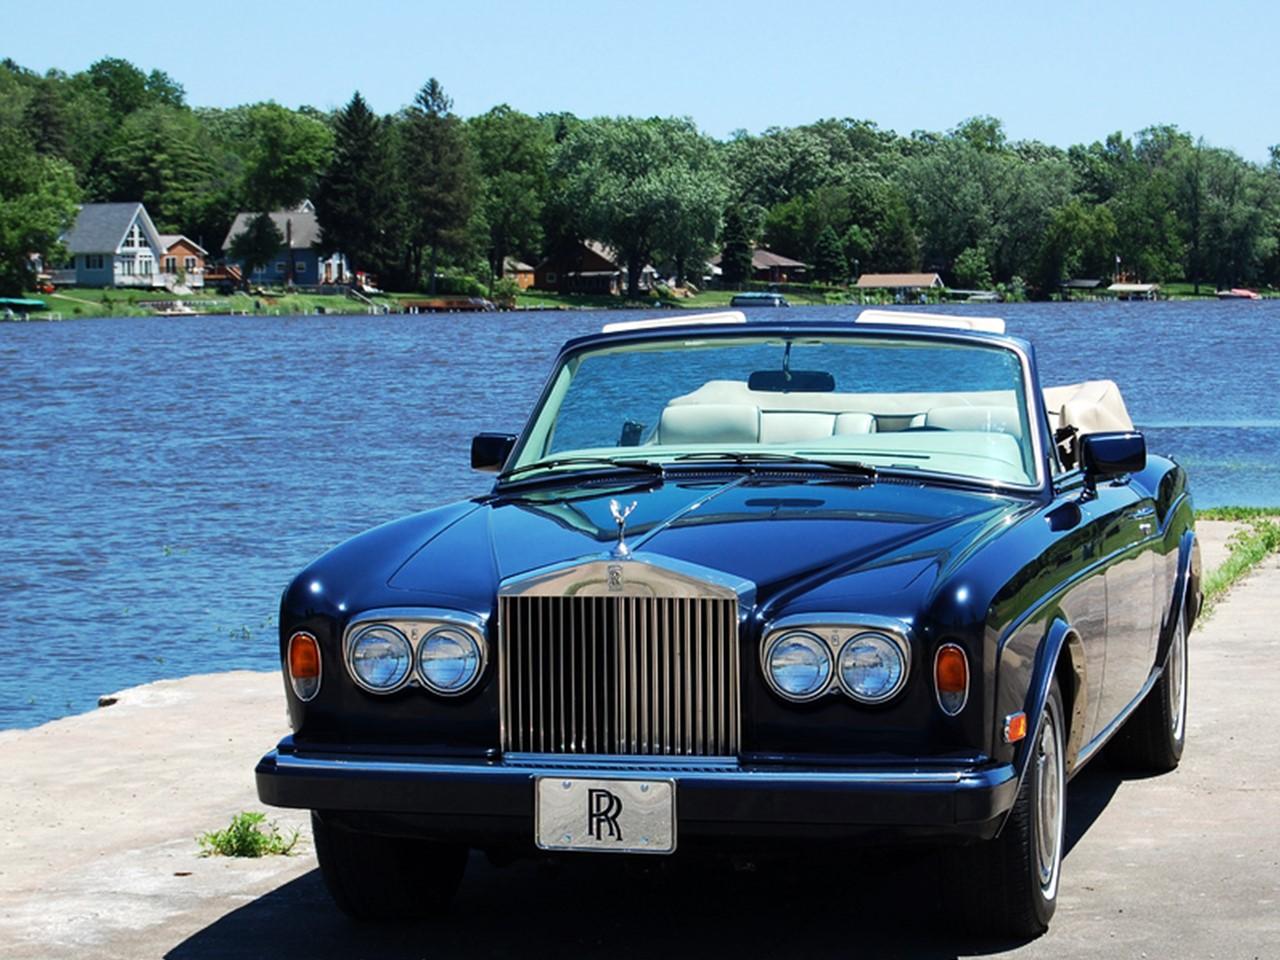 Rolls Royce Corniche Coachbuilt B